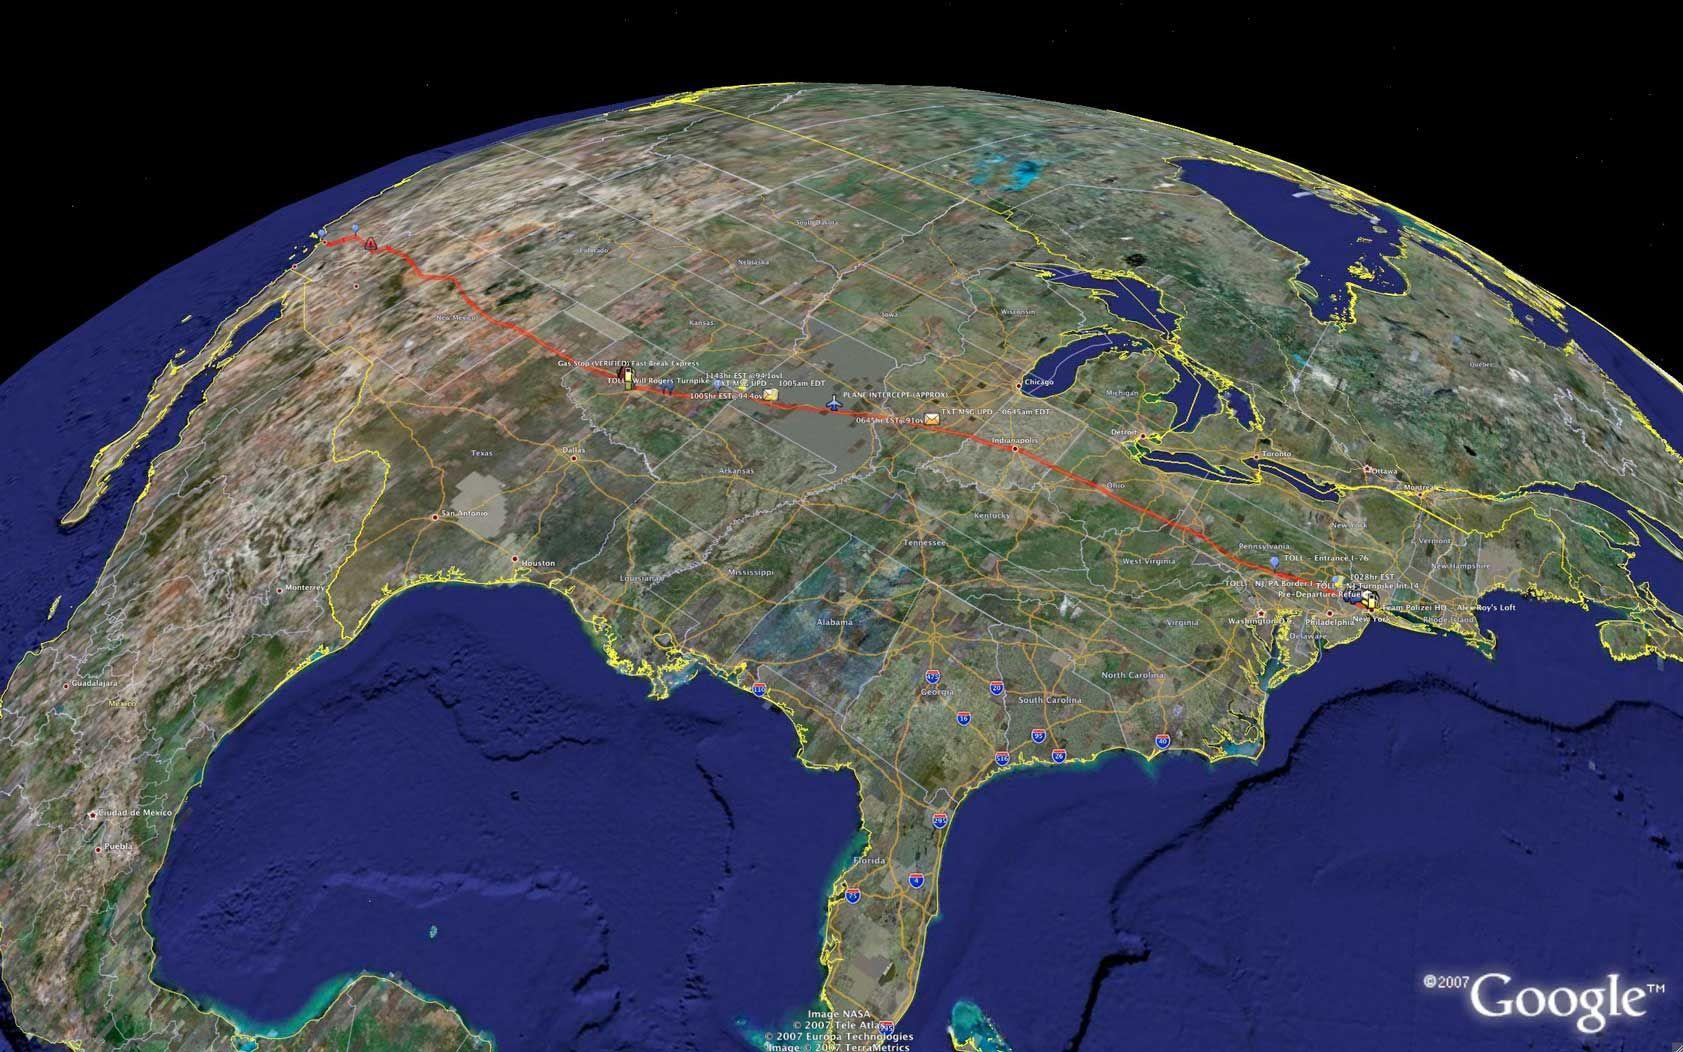 10 أماكن سرية يحجبها جوجل من خرائطه Http Bit Ly 1kyw26q Earth Map Aerial Photo